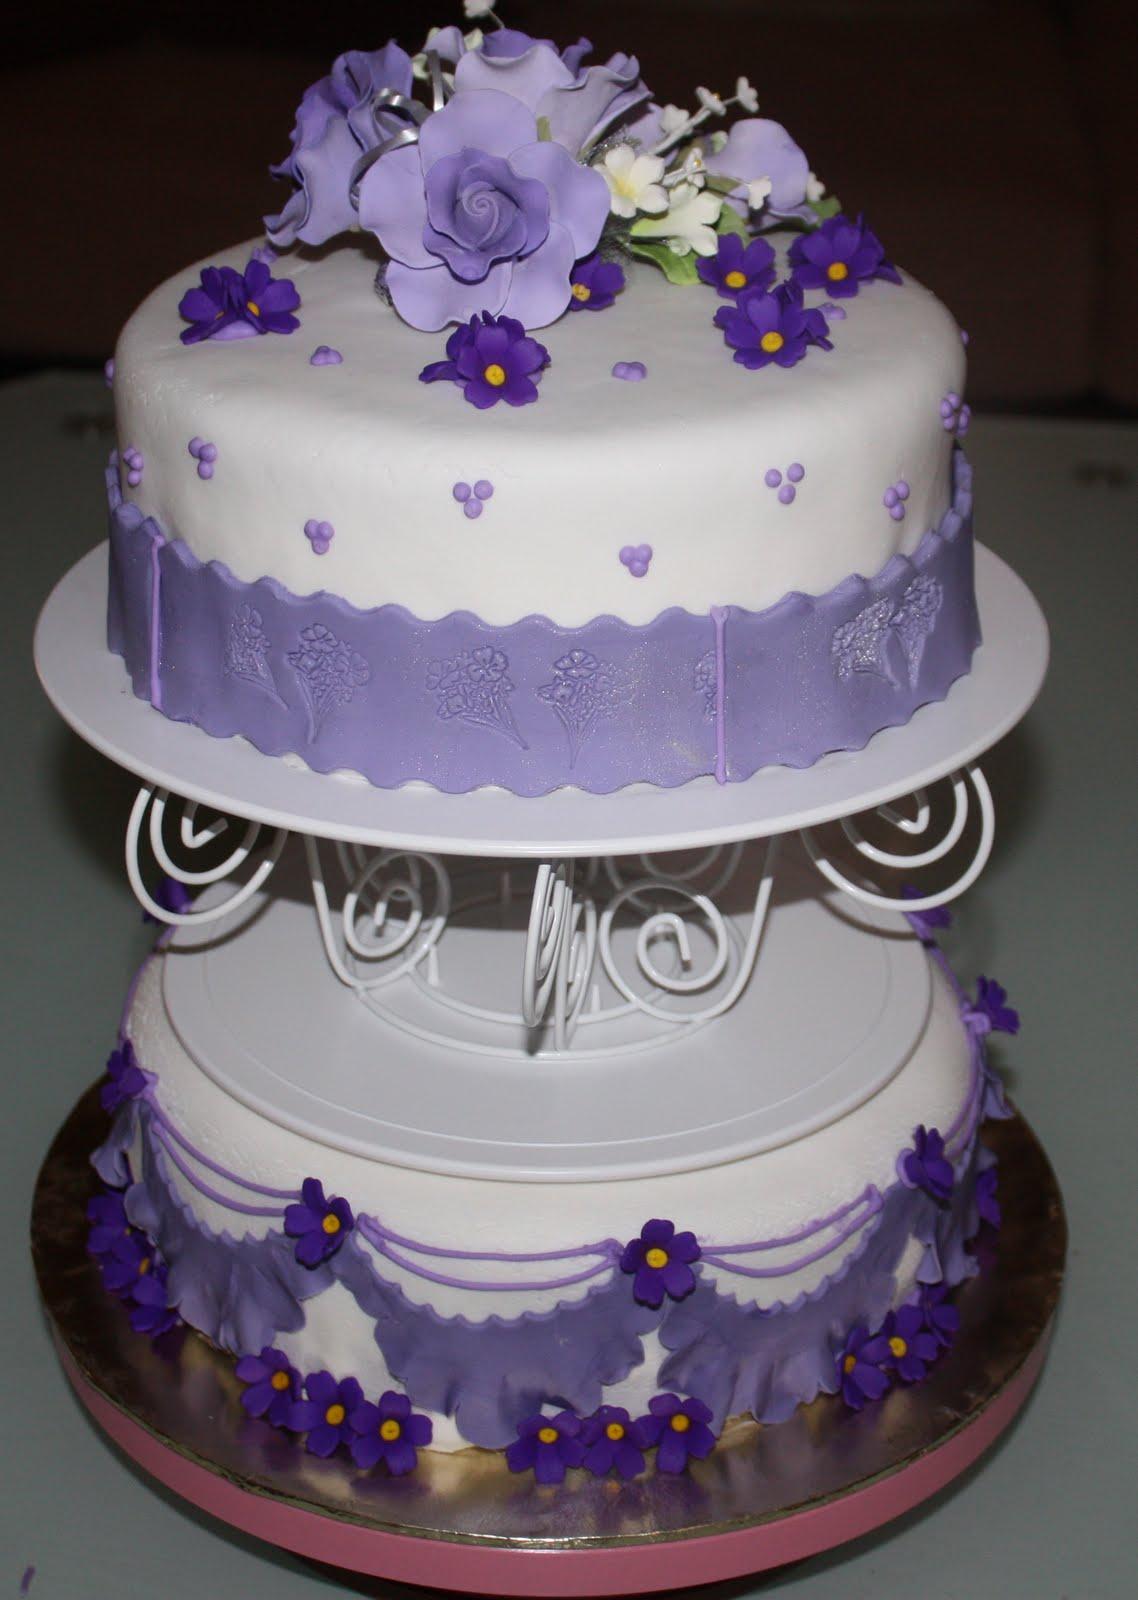 halina 39 s blog silver purple wedding cake. Black Bedroom Furniture Sets. Home Design Ideas